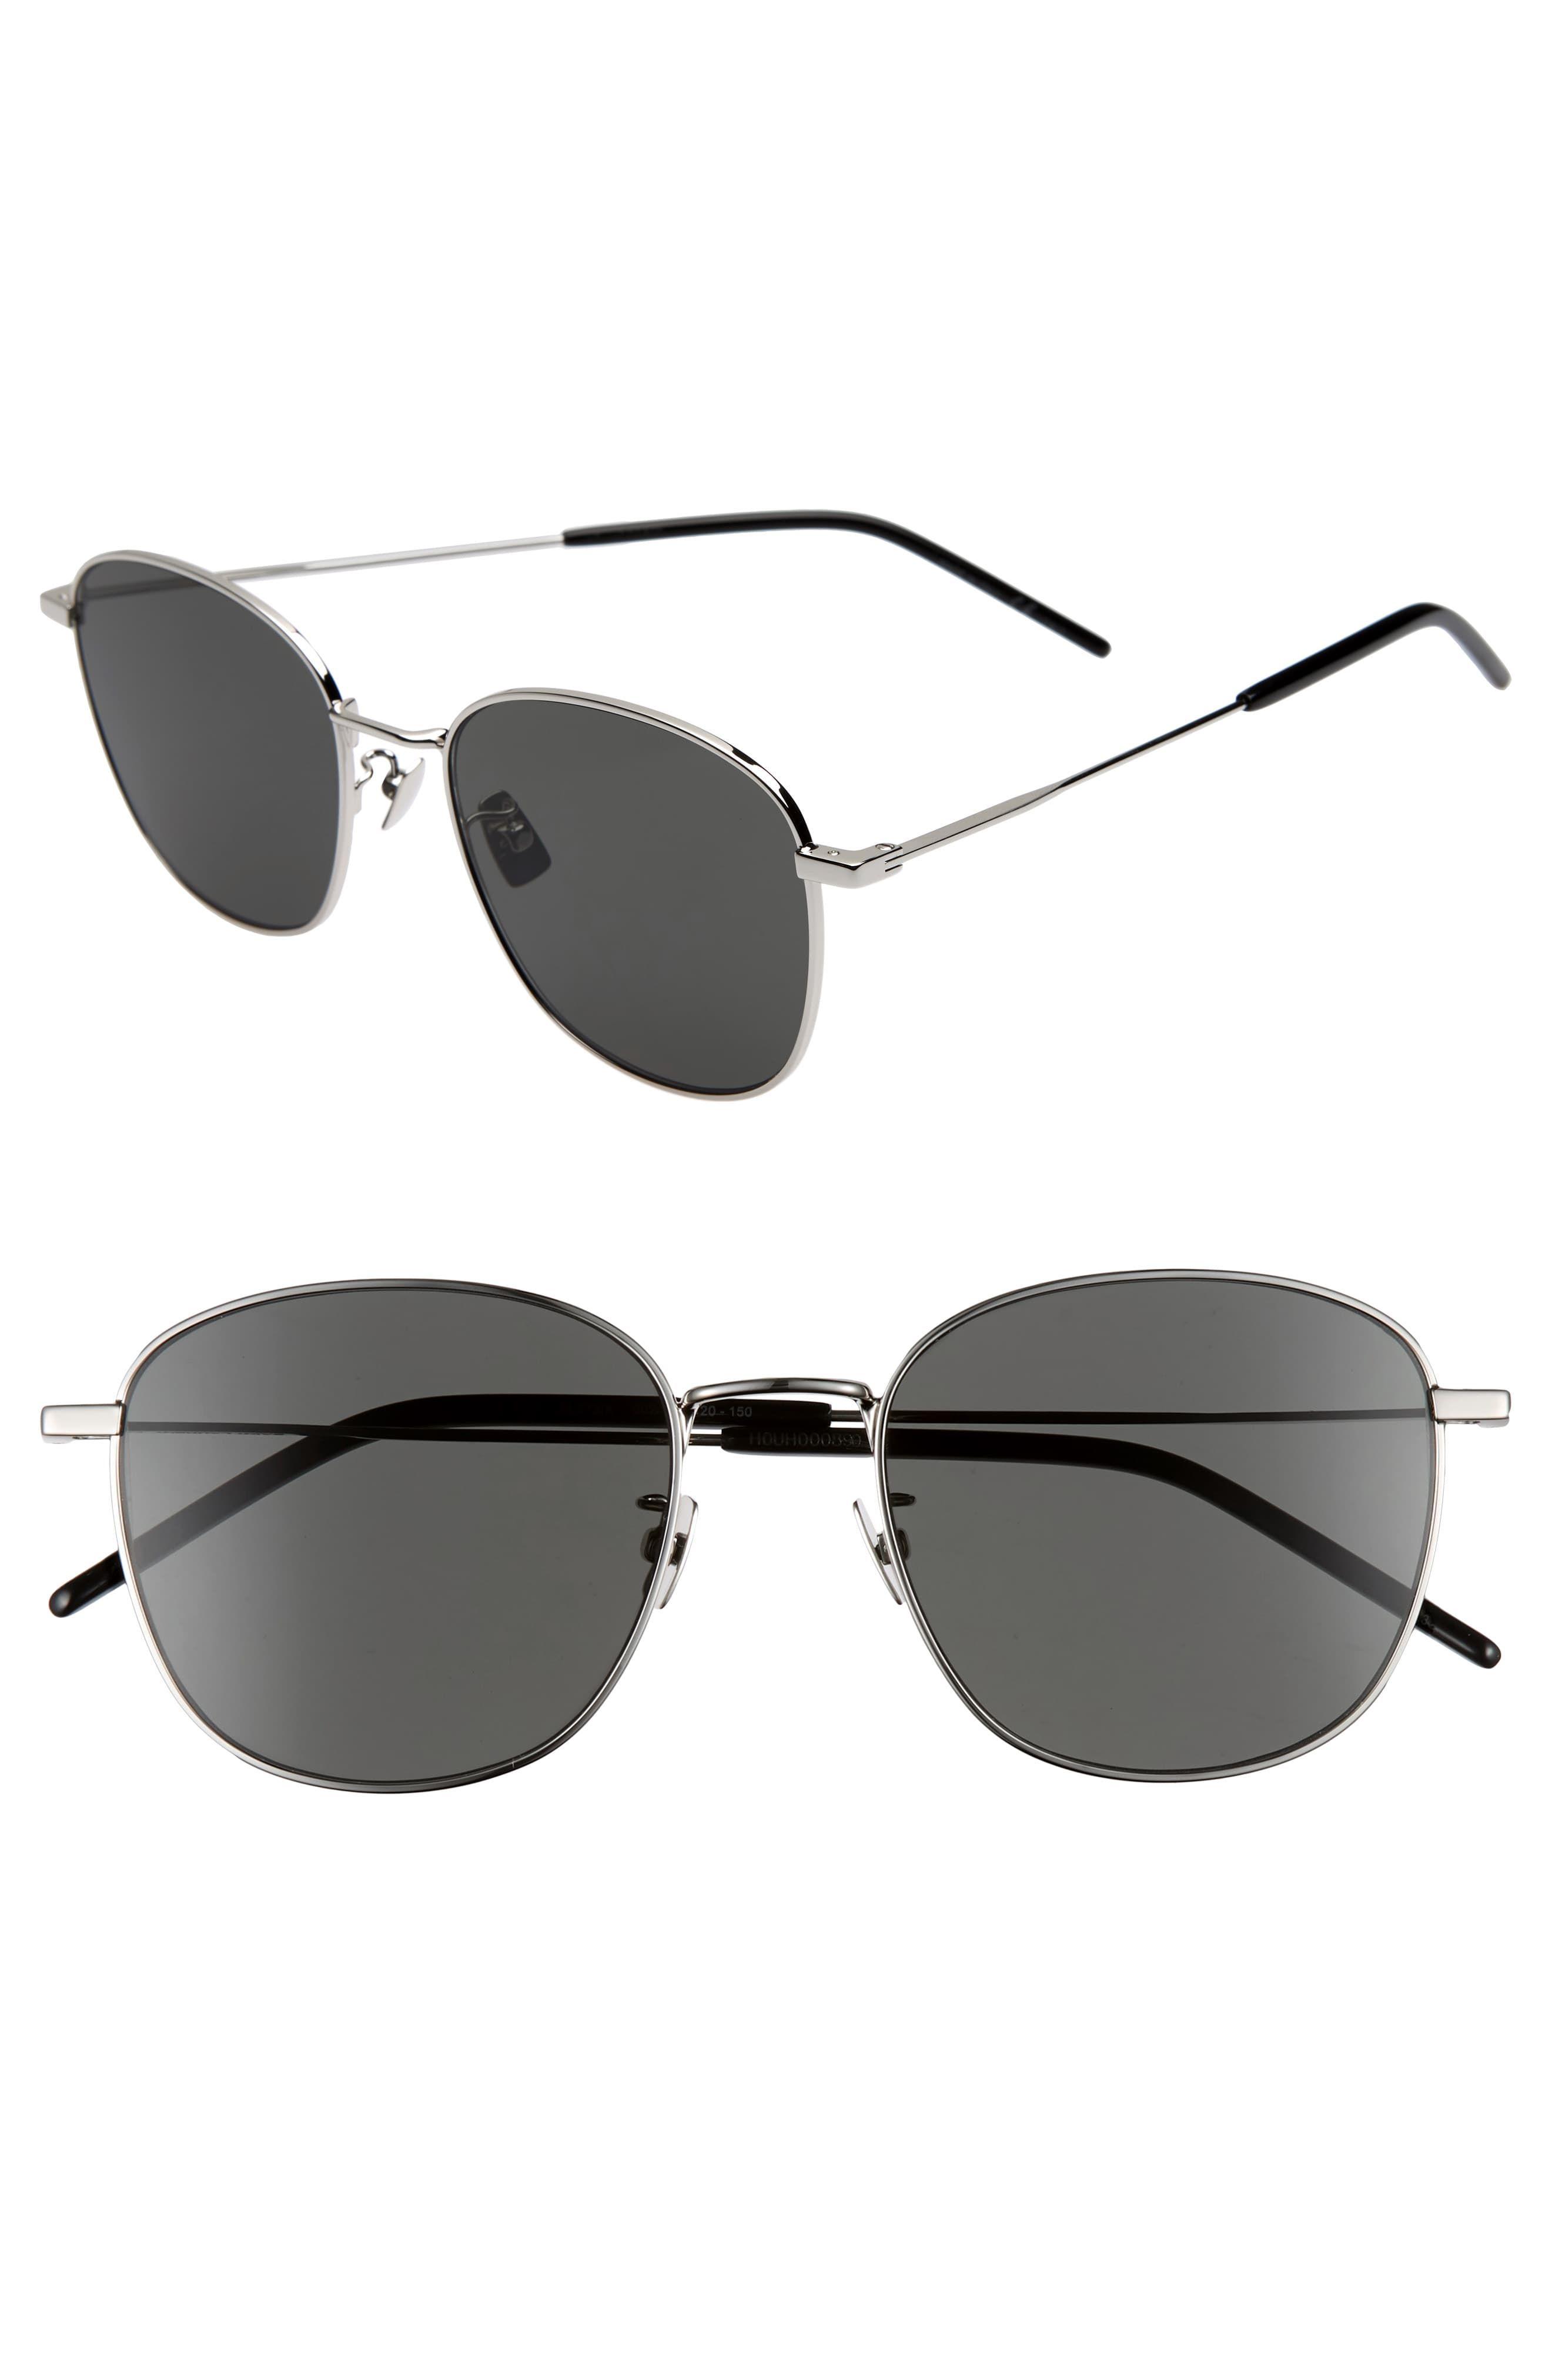 2d7841410ac Saint Laurent 56mm Square Sunglasses in 2019 | Products | Sunglasses ...